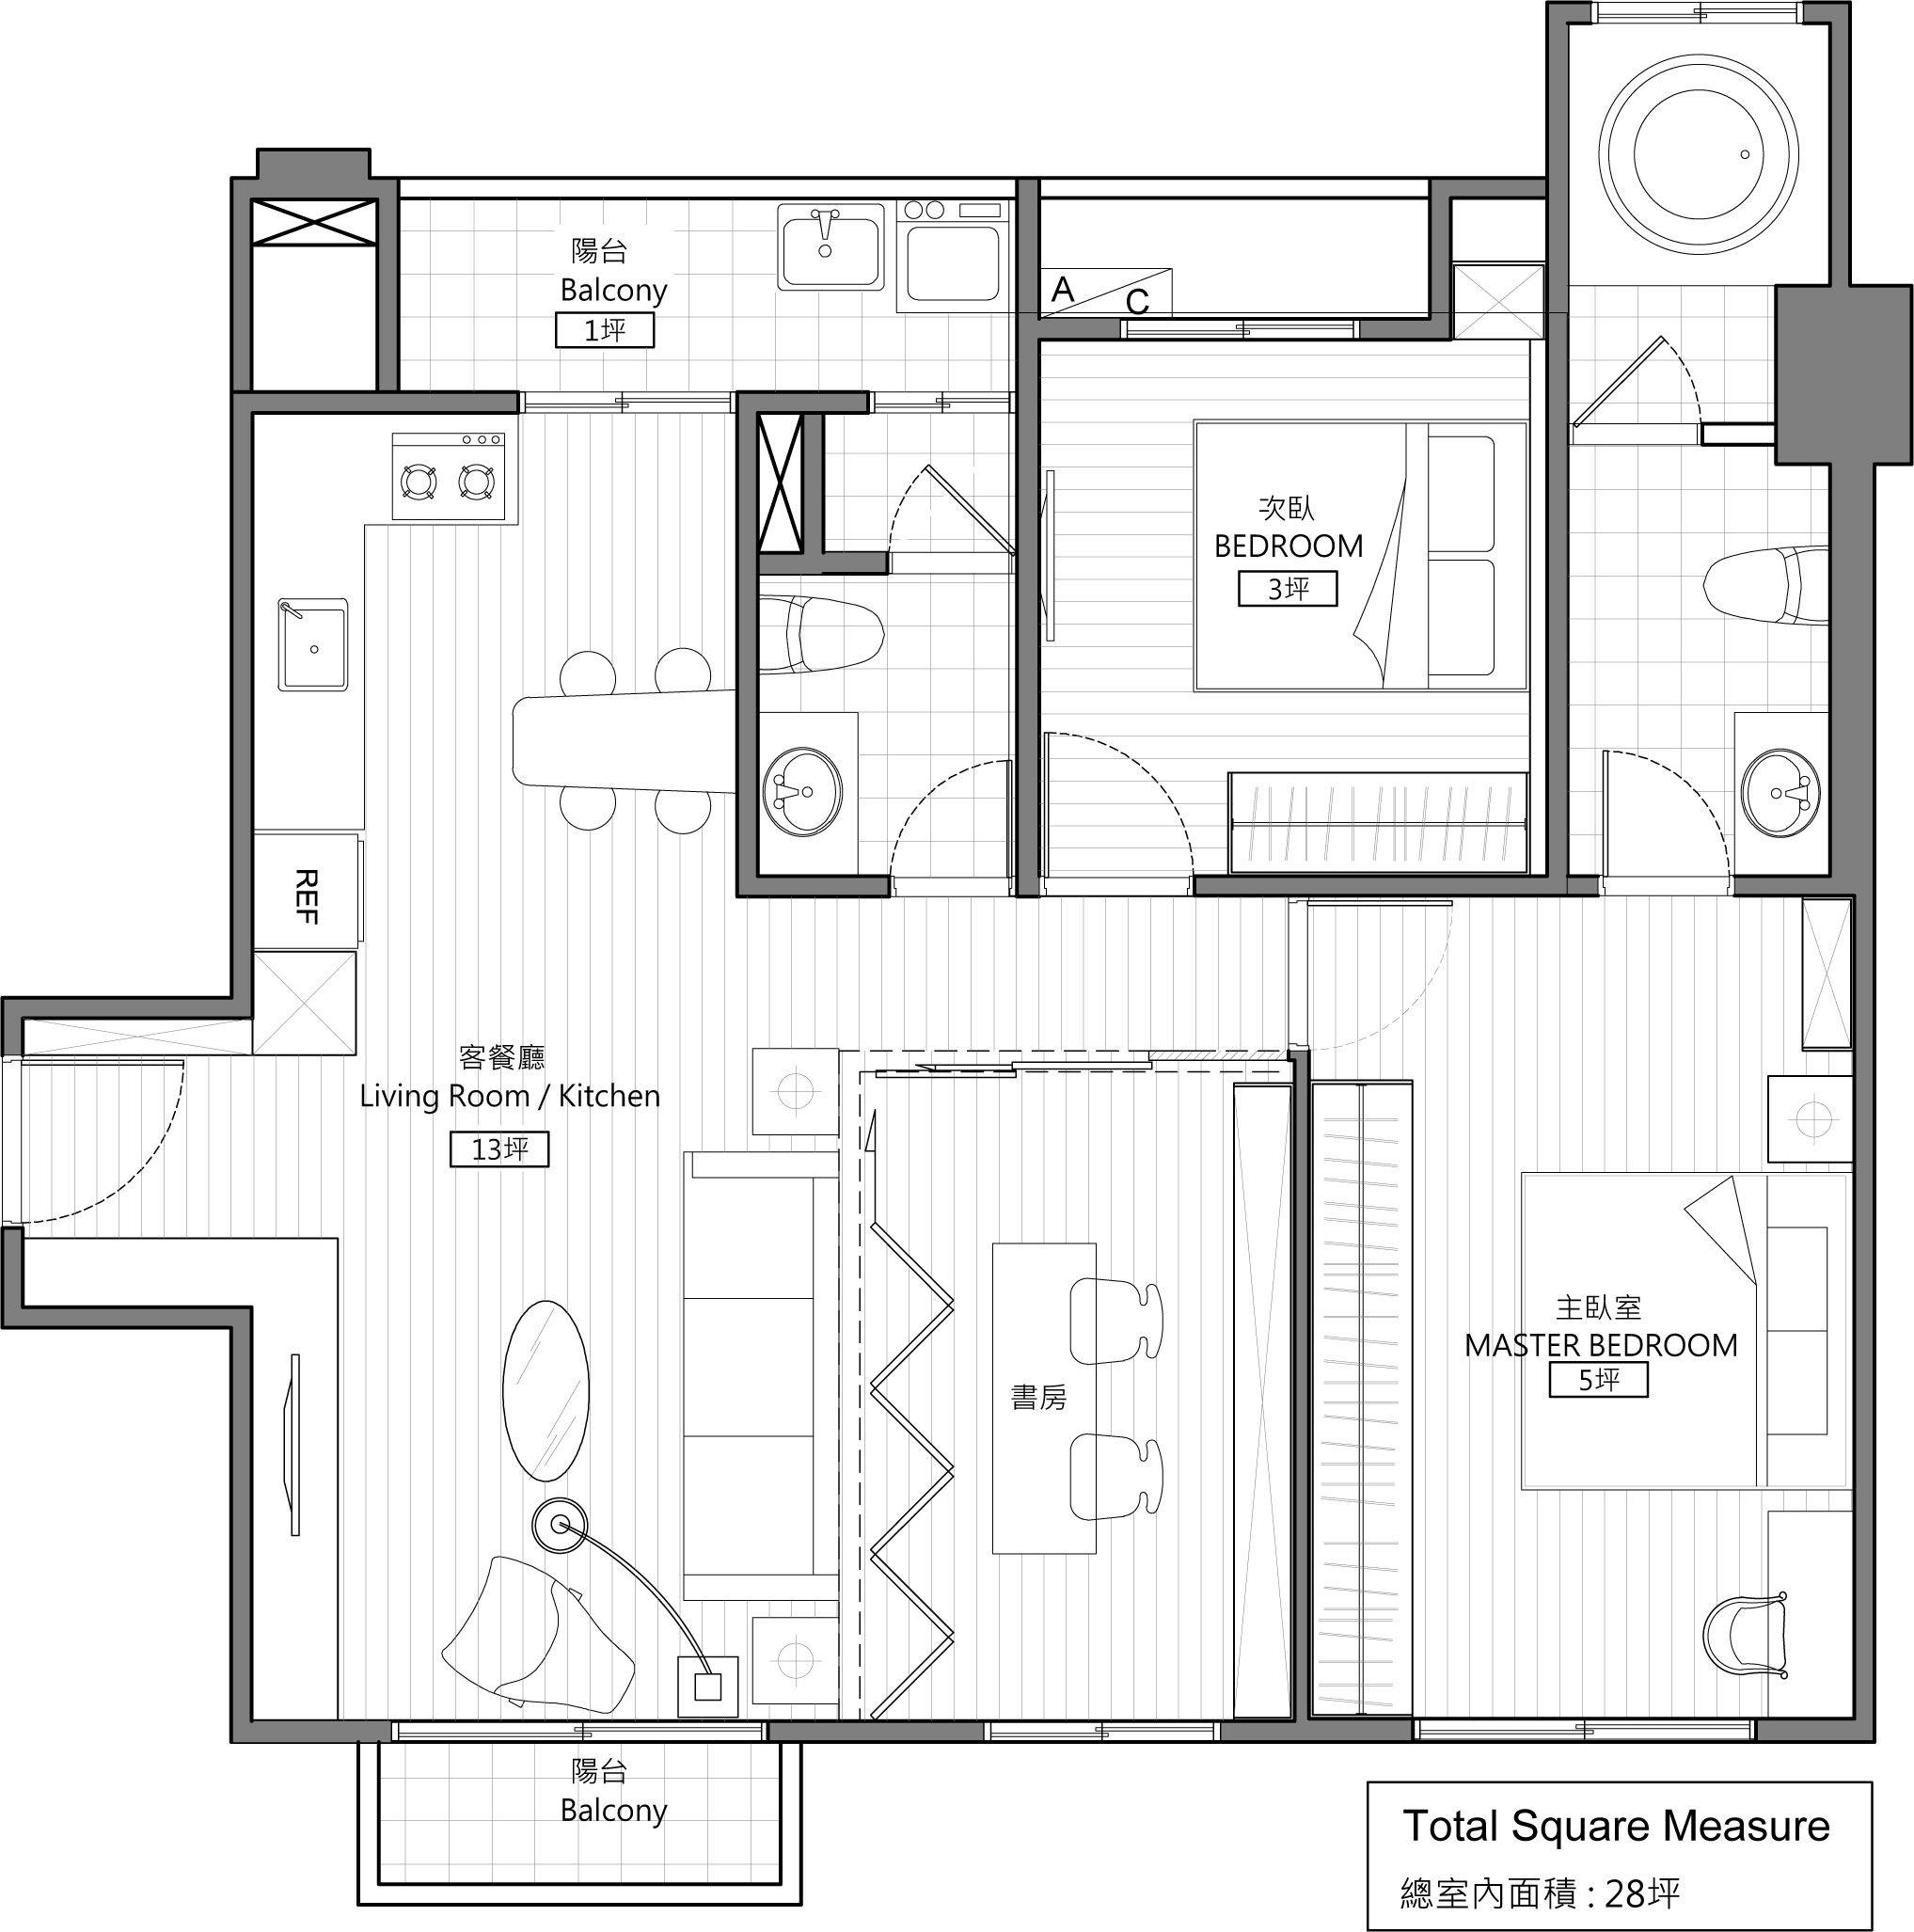 Dise o departamento dos dormitorios planos construye hogar for Medidas de muebles para planos arquitectonicos